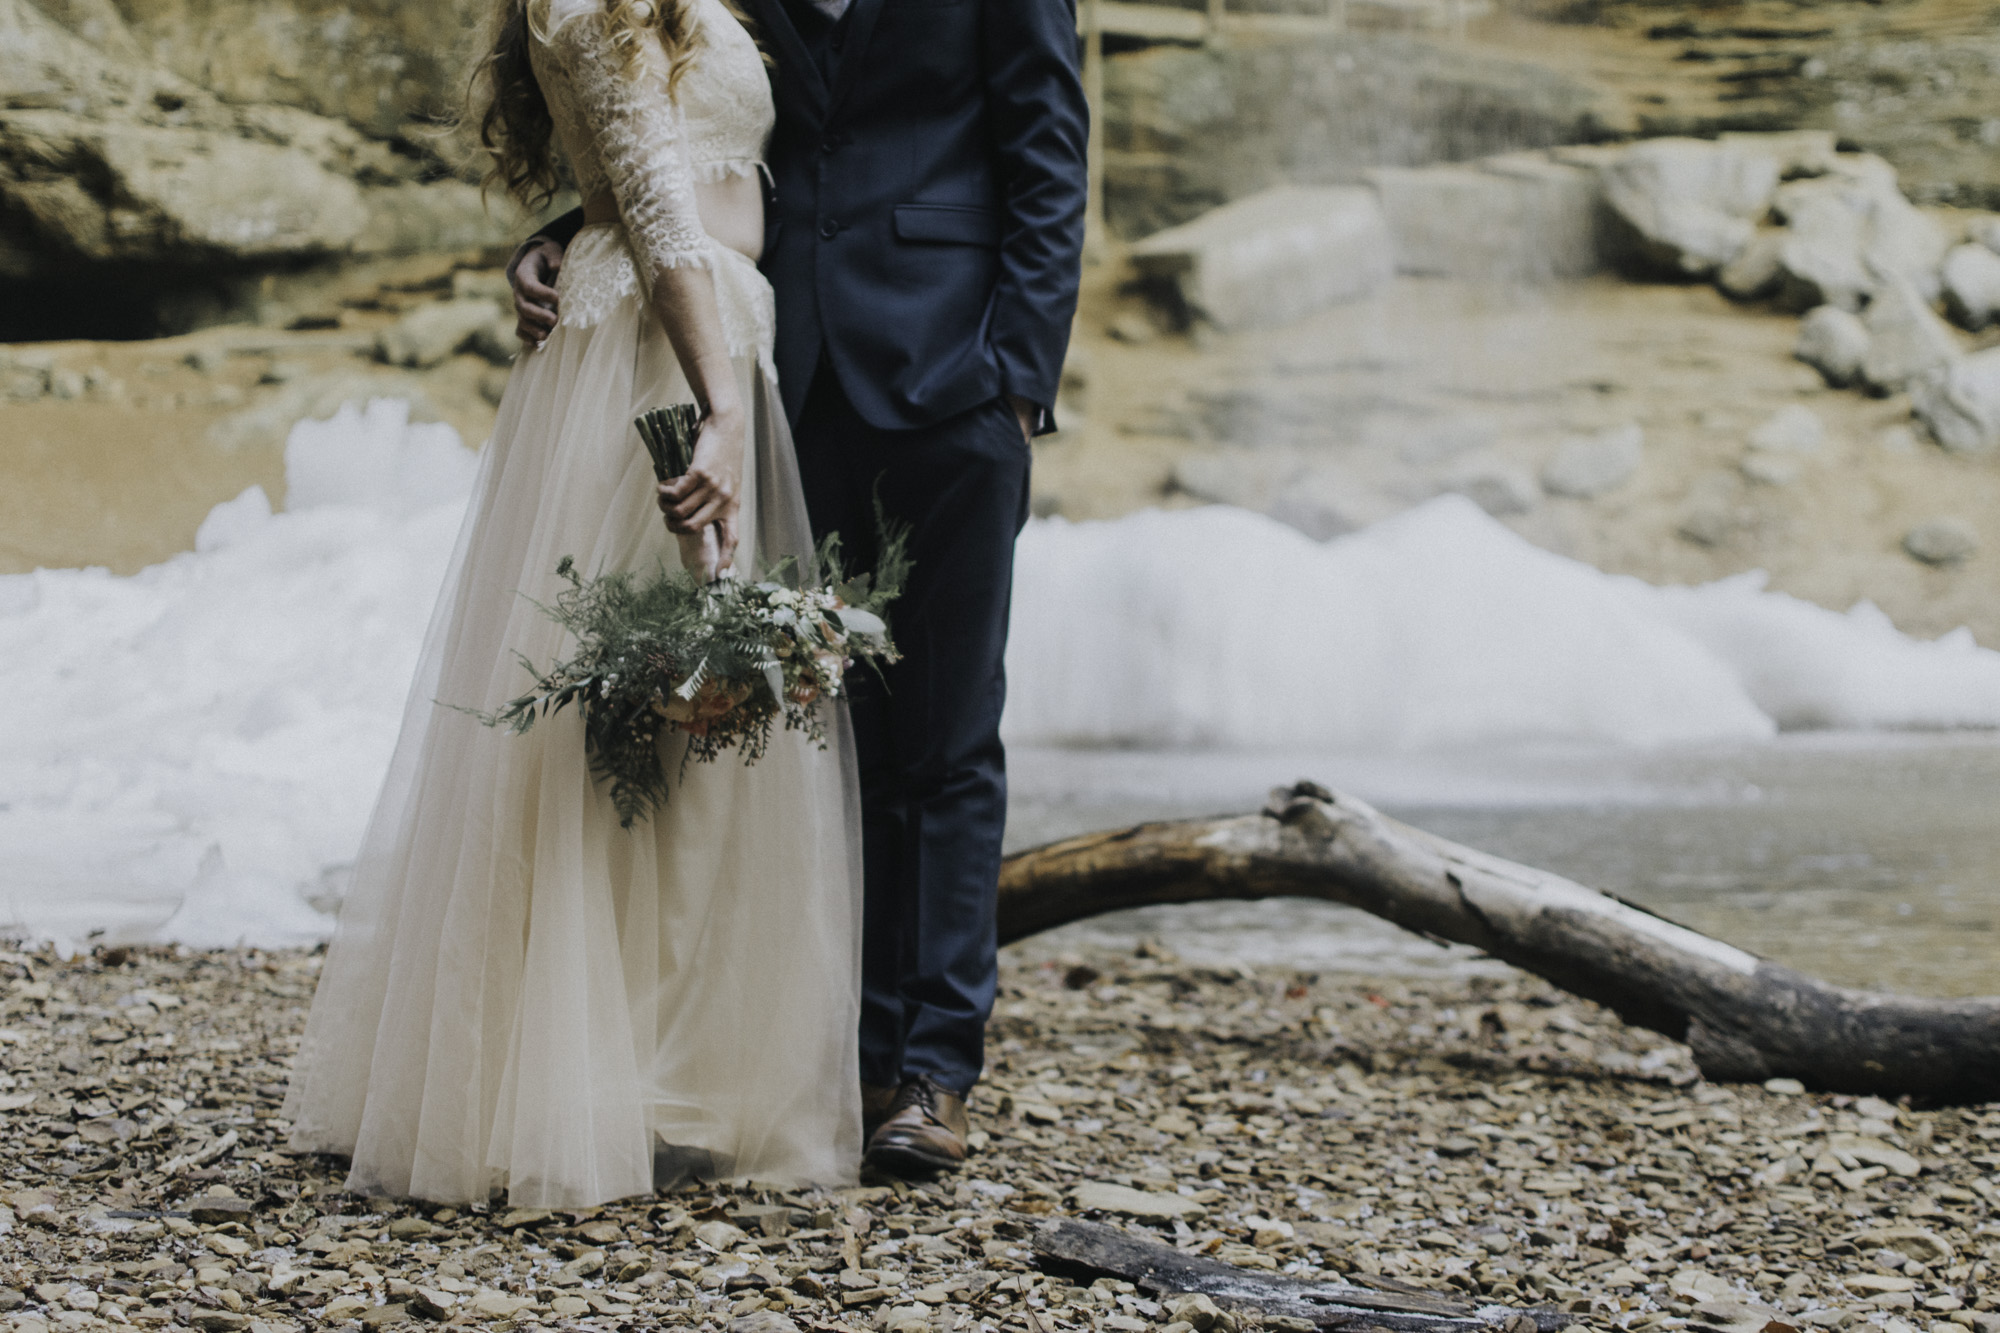 Cate_Ann_Photography_Dayton_Ohio_Wedding_Elopement_And_Engagement_PhotographerDSC_6066.jpg